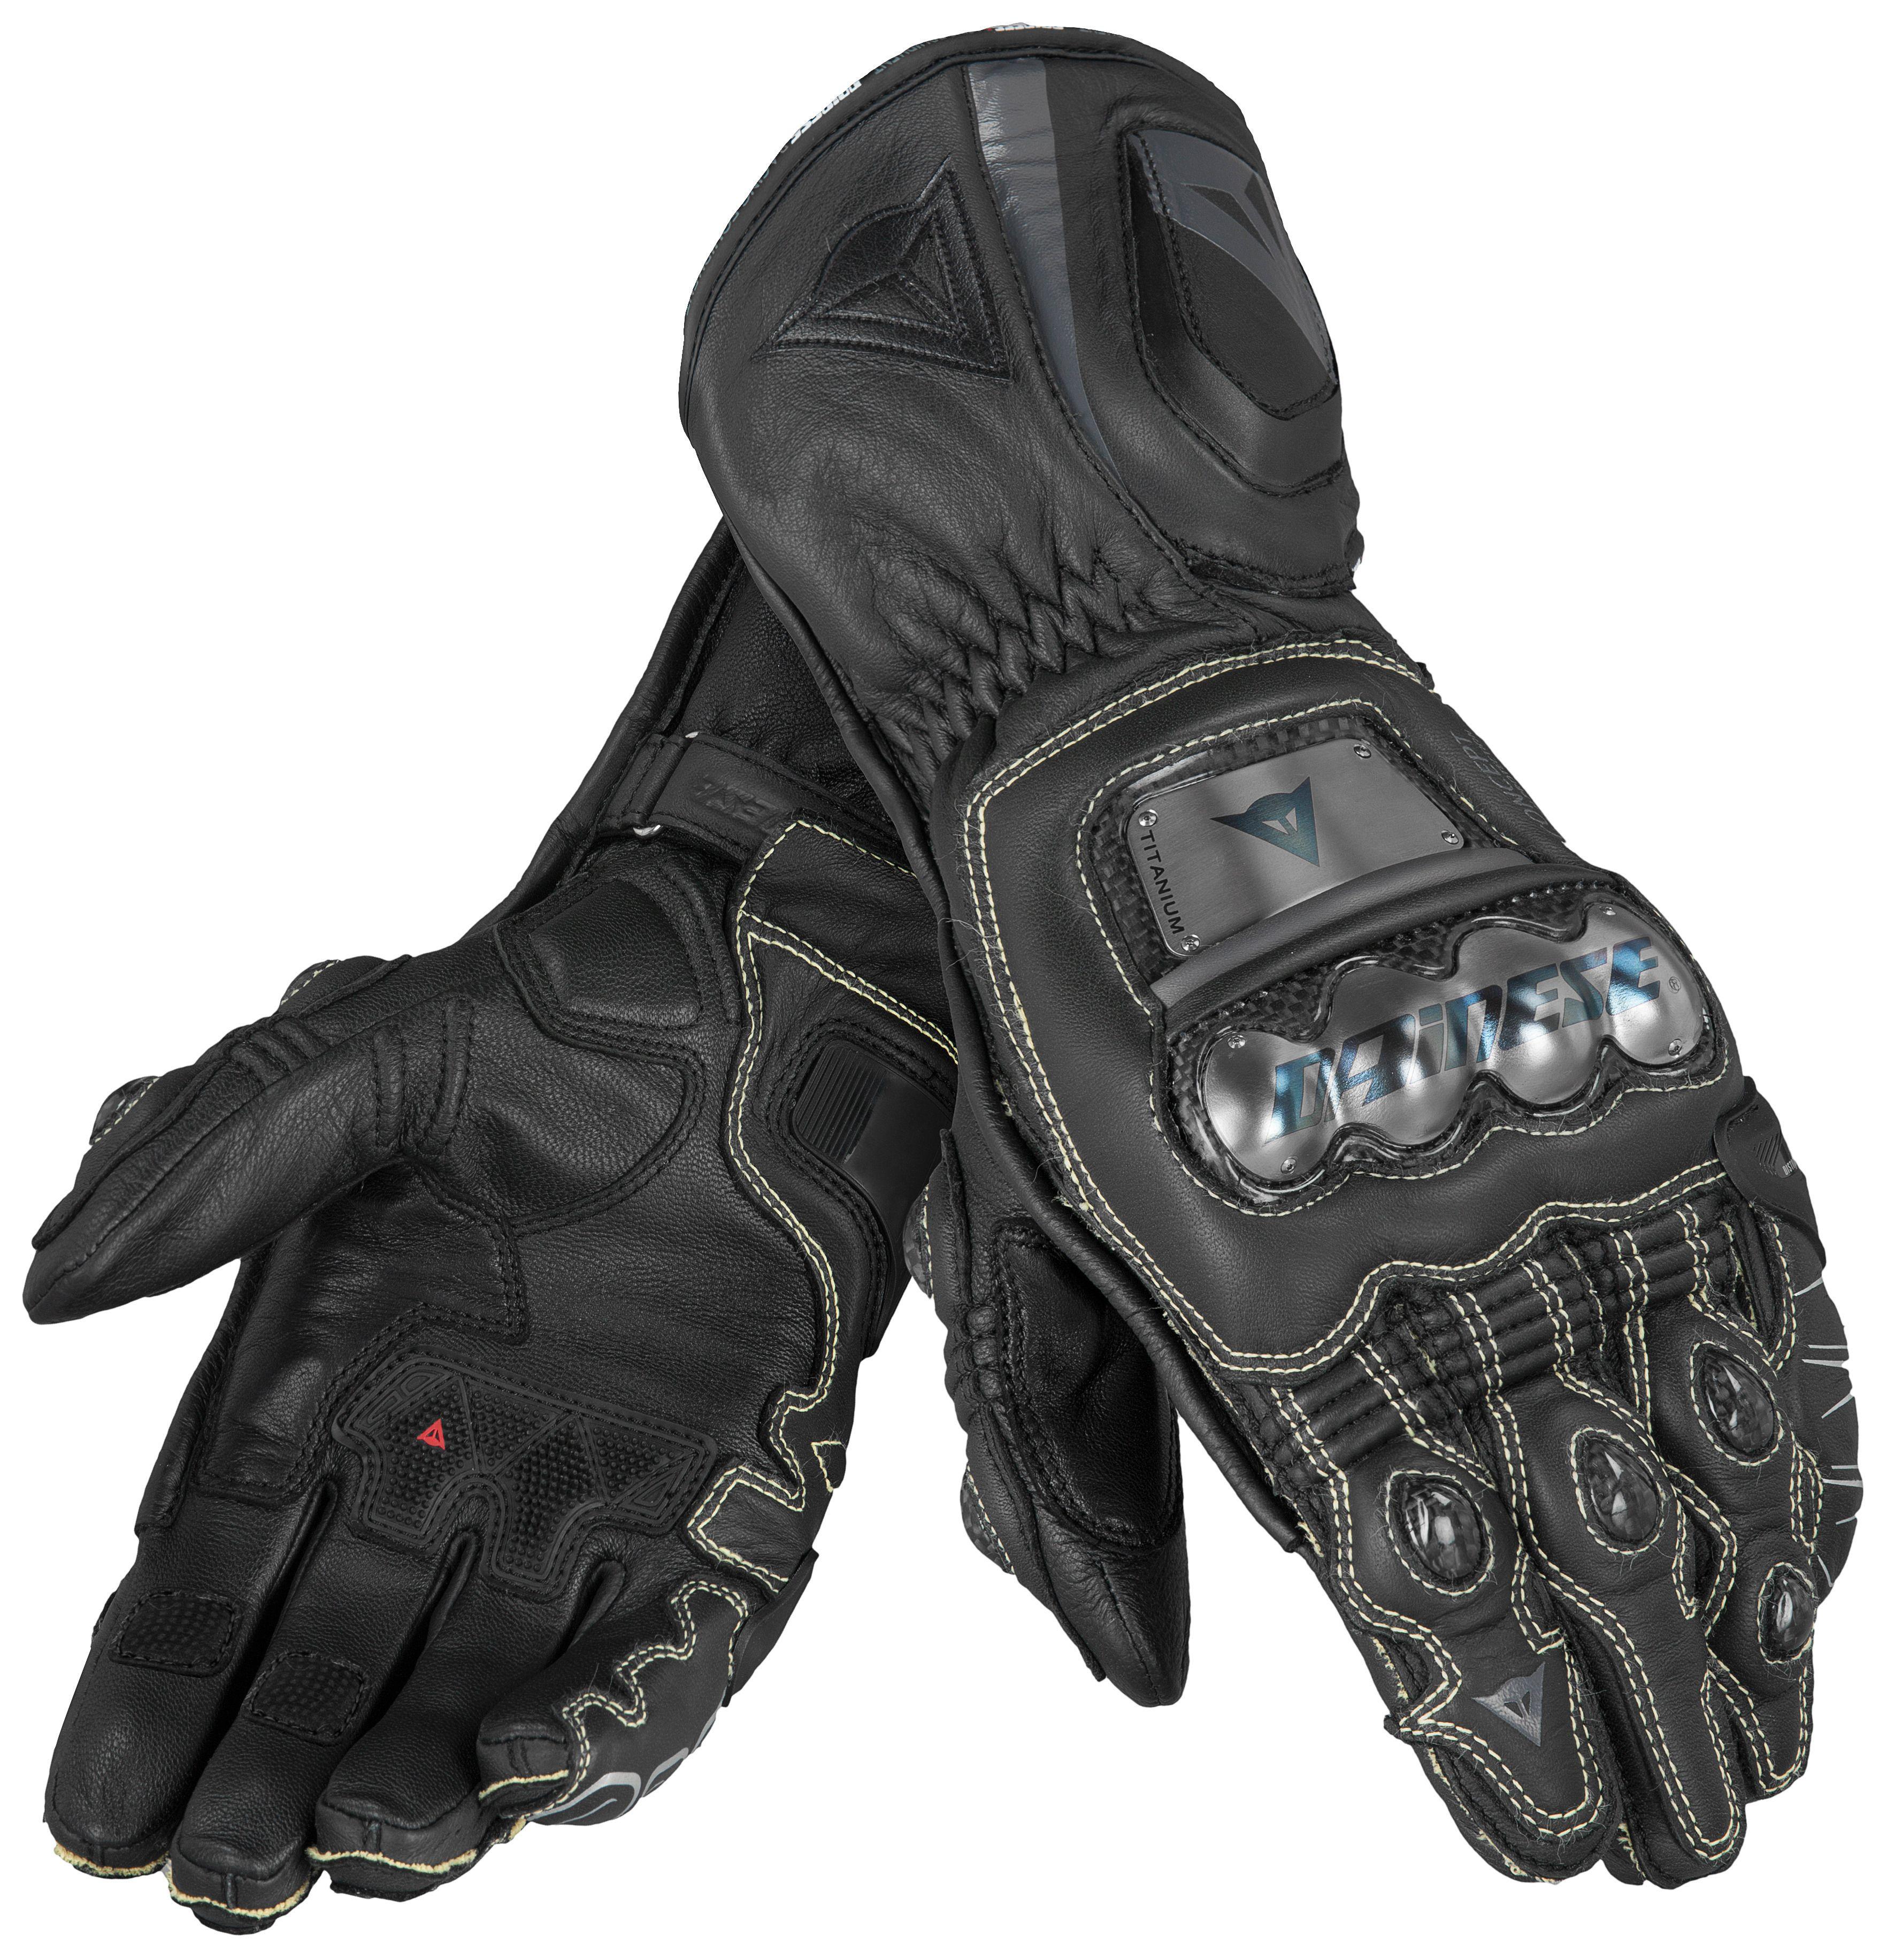 Dainese Full Metal D1 Gloves Revzilla